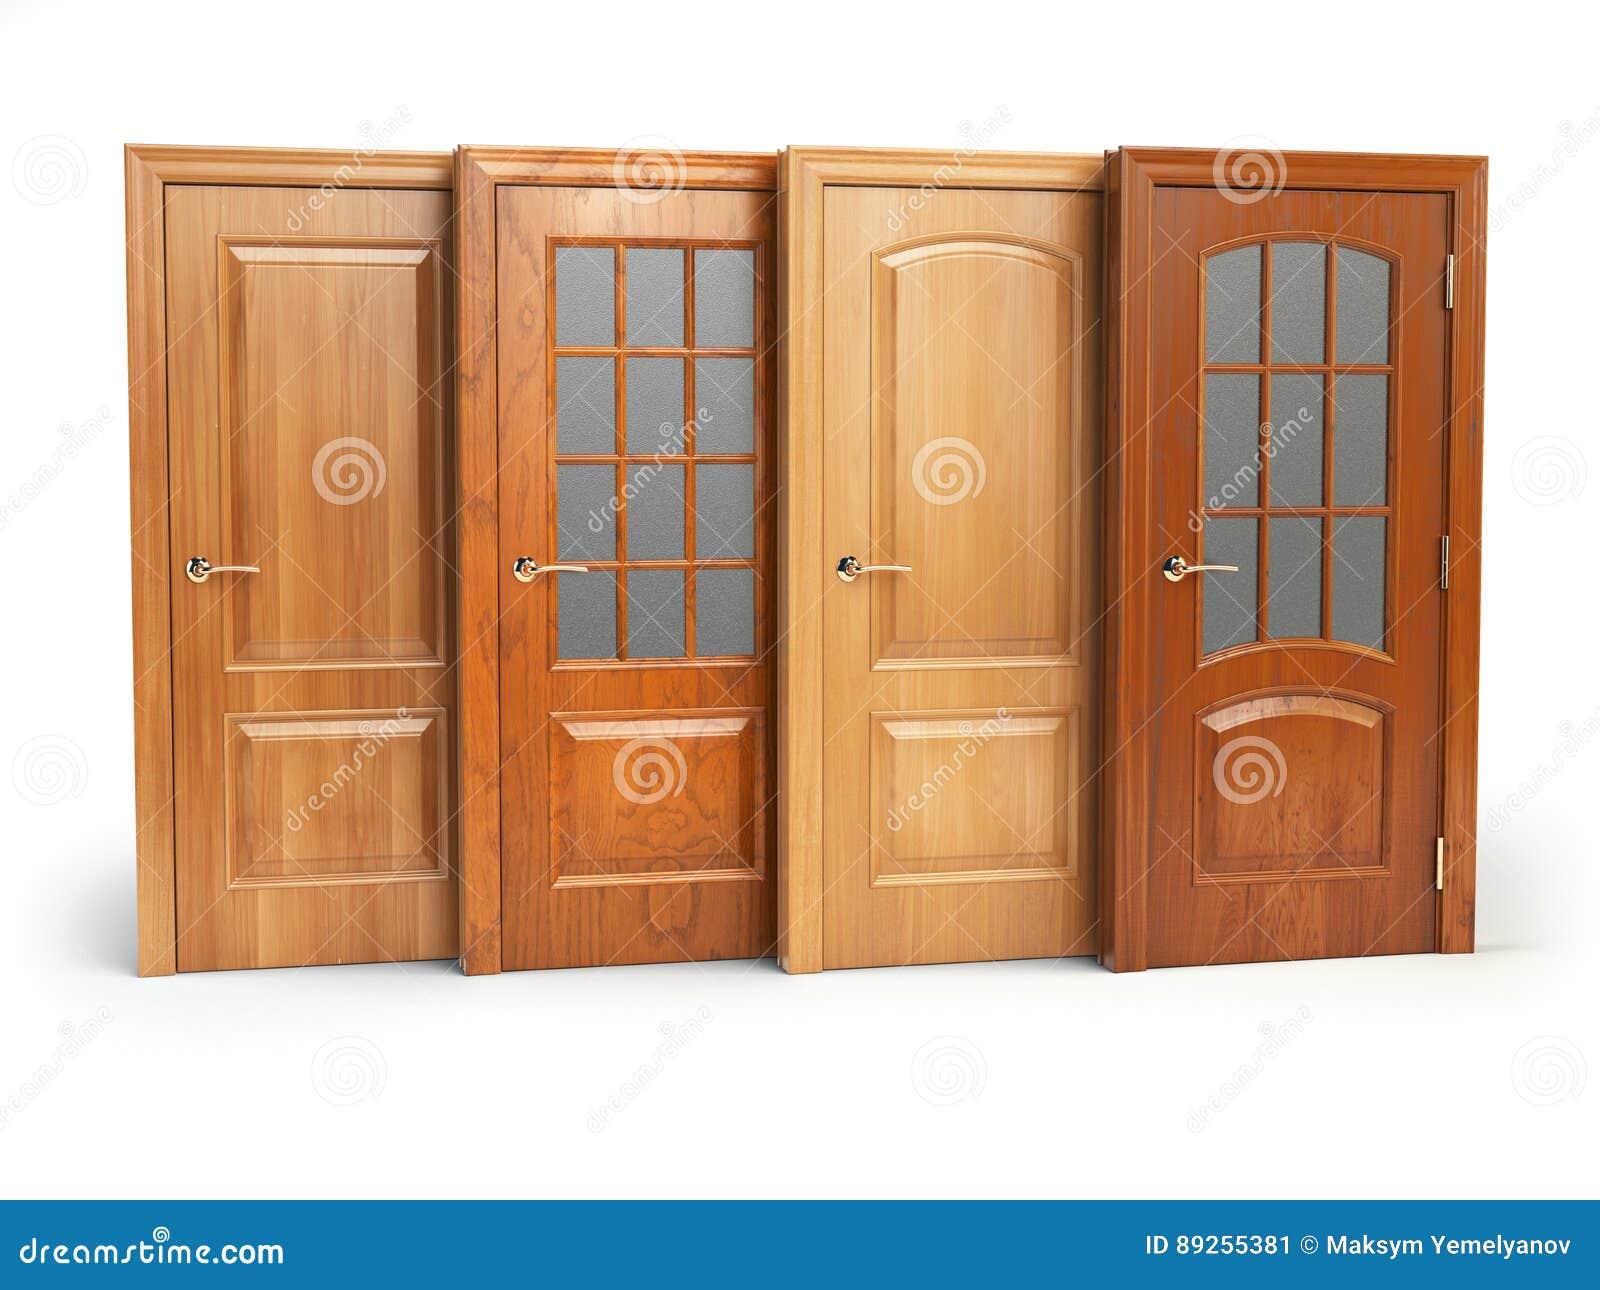 Puertas de diseo interior cheap puerta interior de diseo for Puertas de interior baratas en vigo